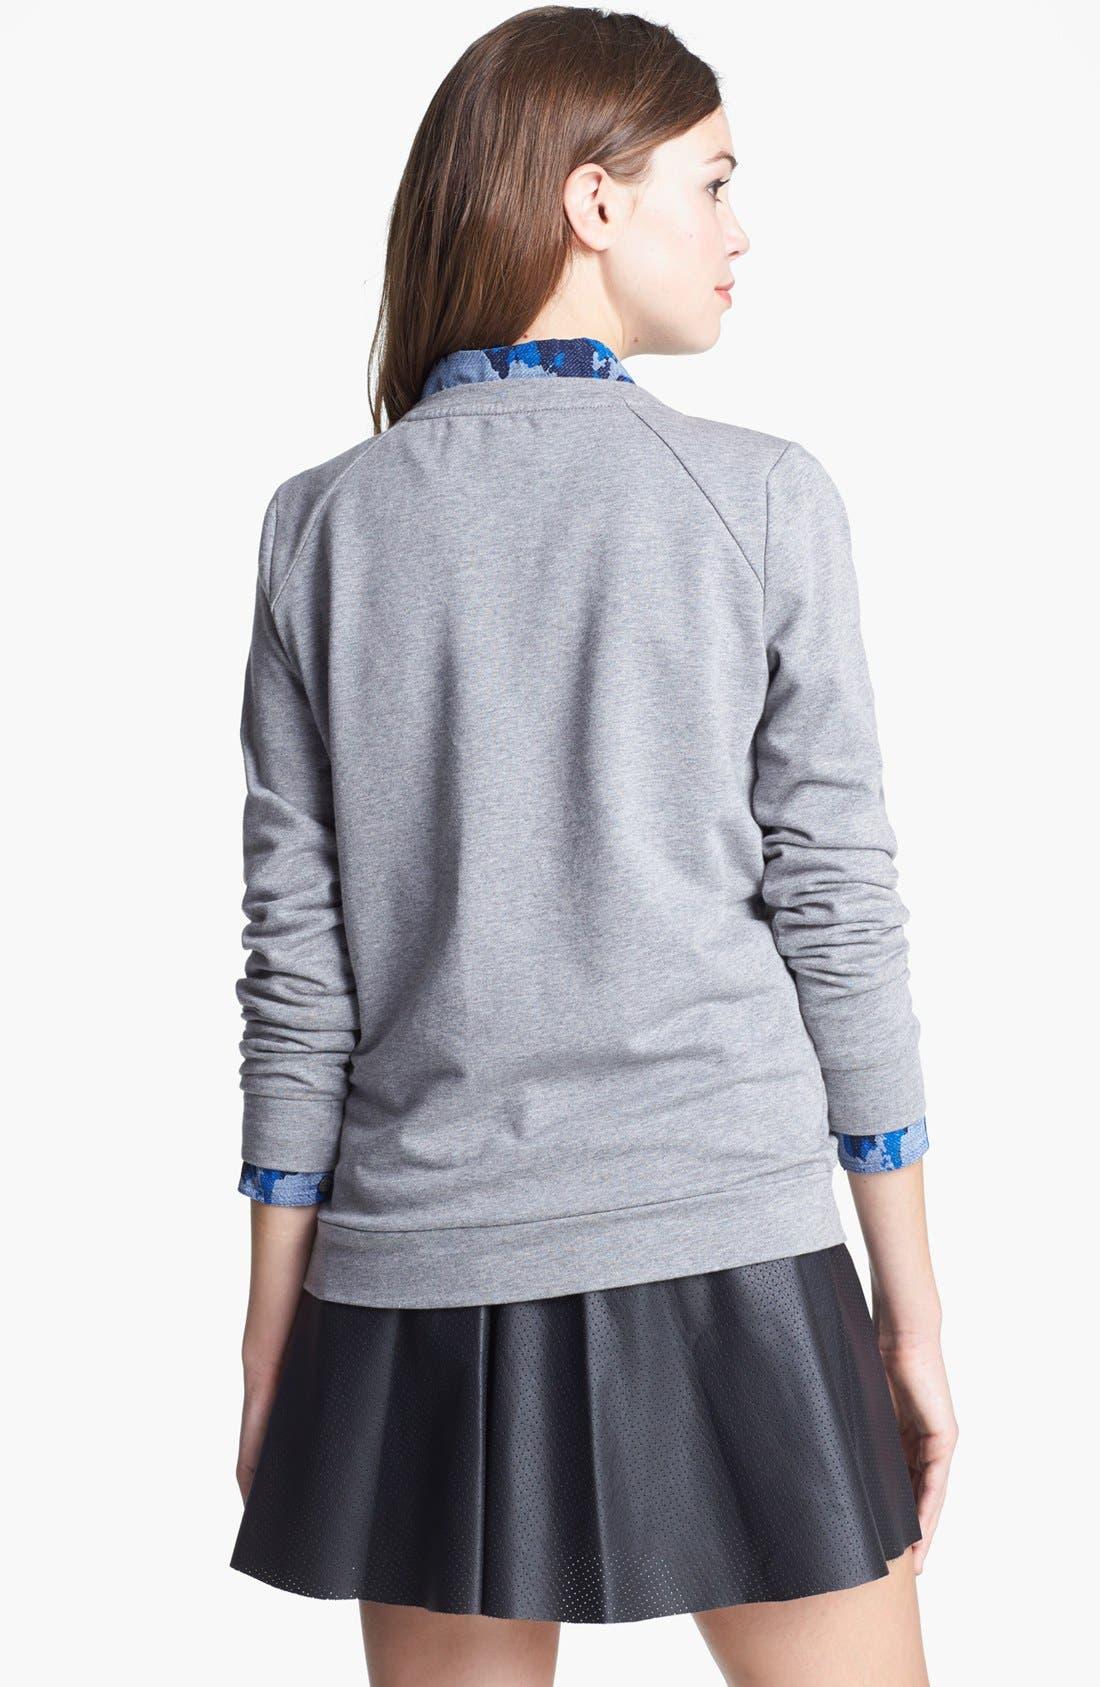 Alternate Image 2  - Two by Vince Camuto Jeweled Baseball Sweatshirt (Petite)